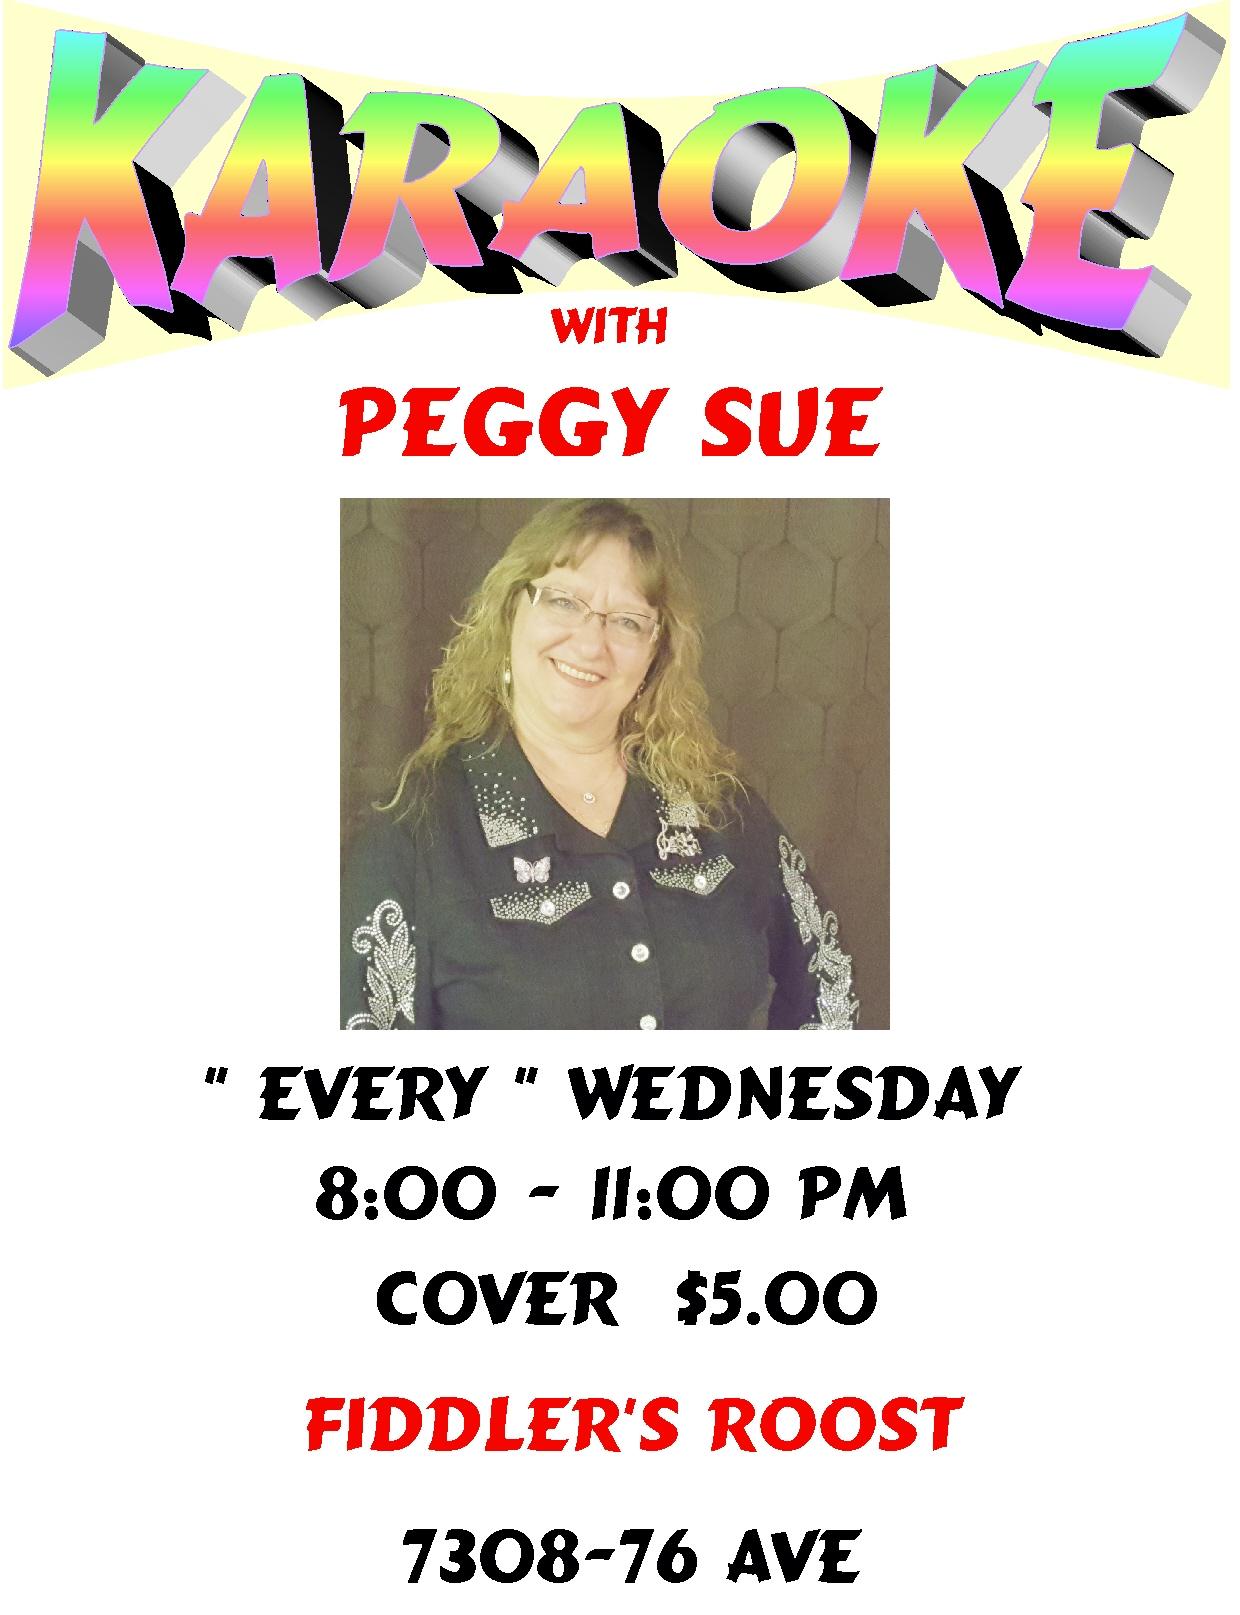 Karaoke Night with Peggy Sue